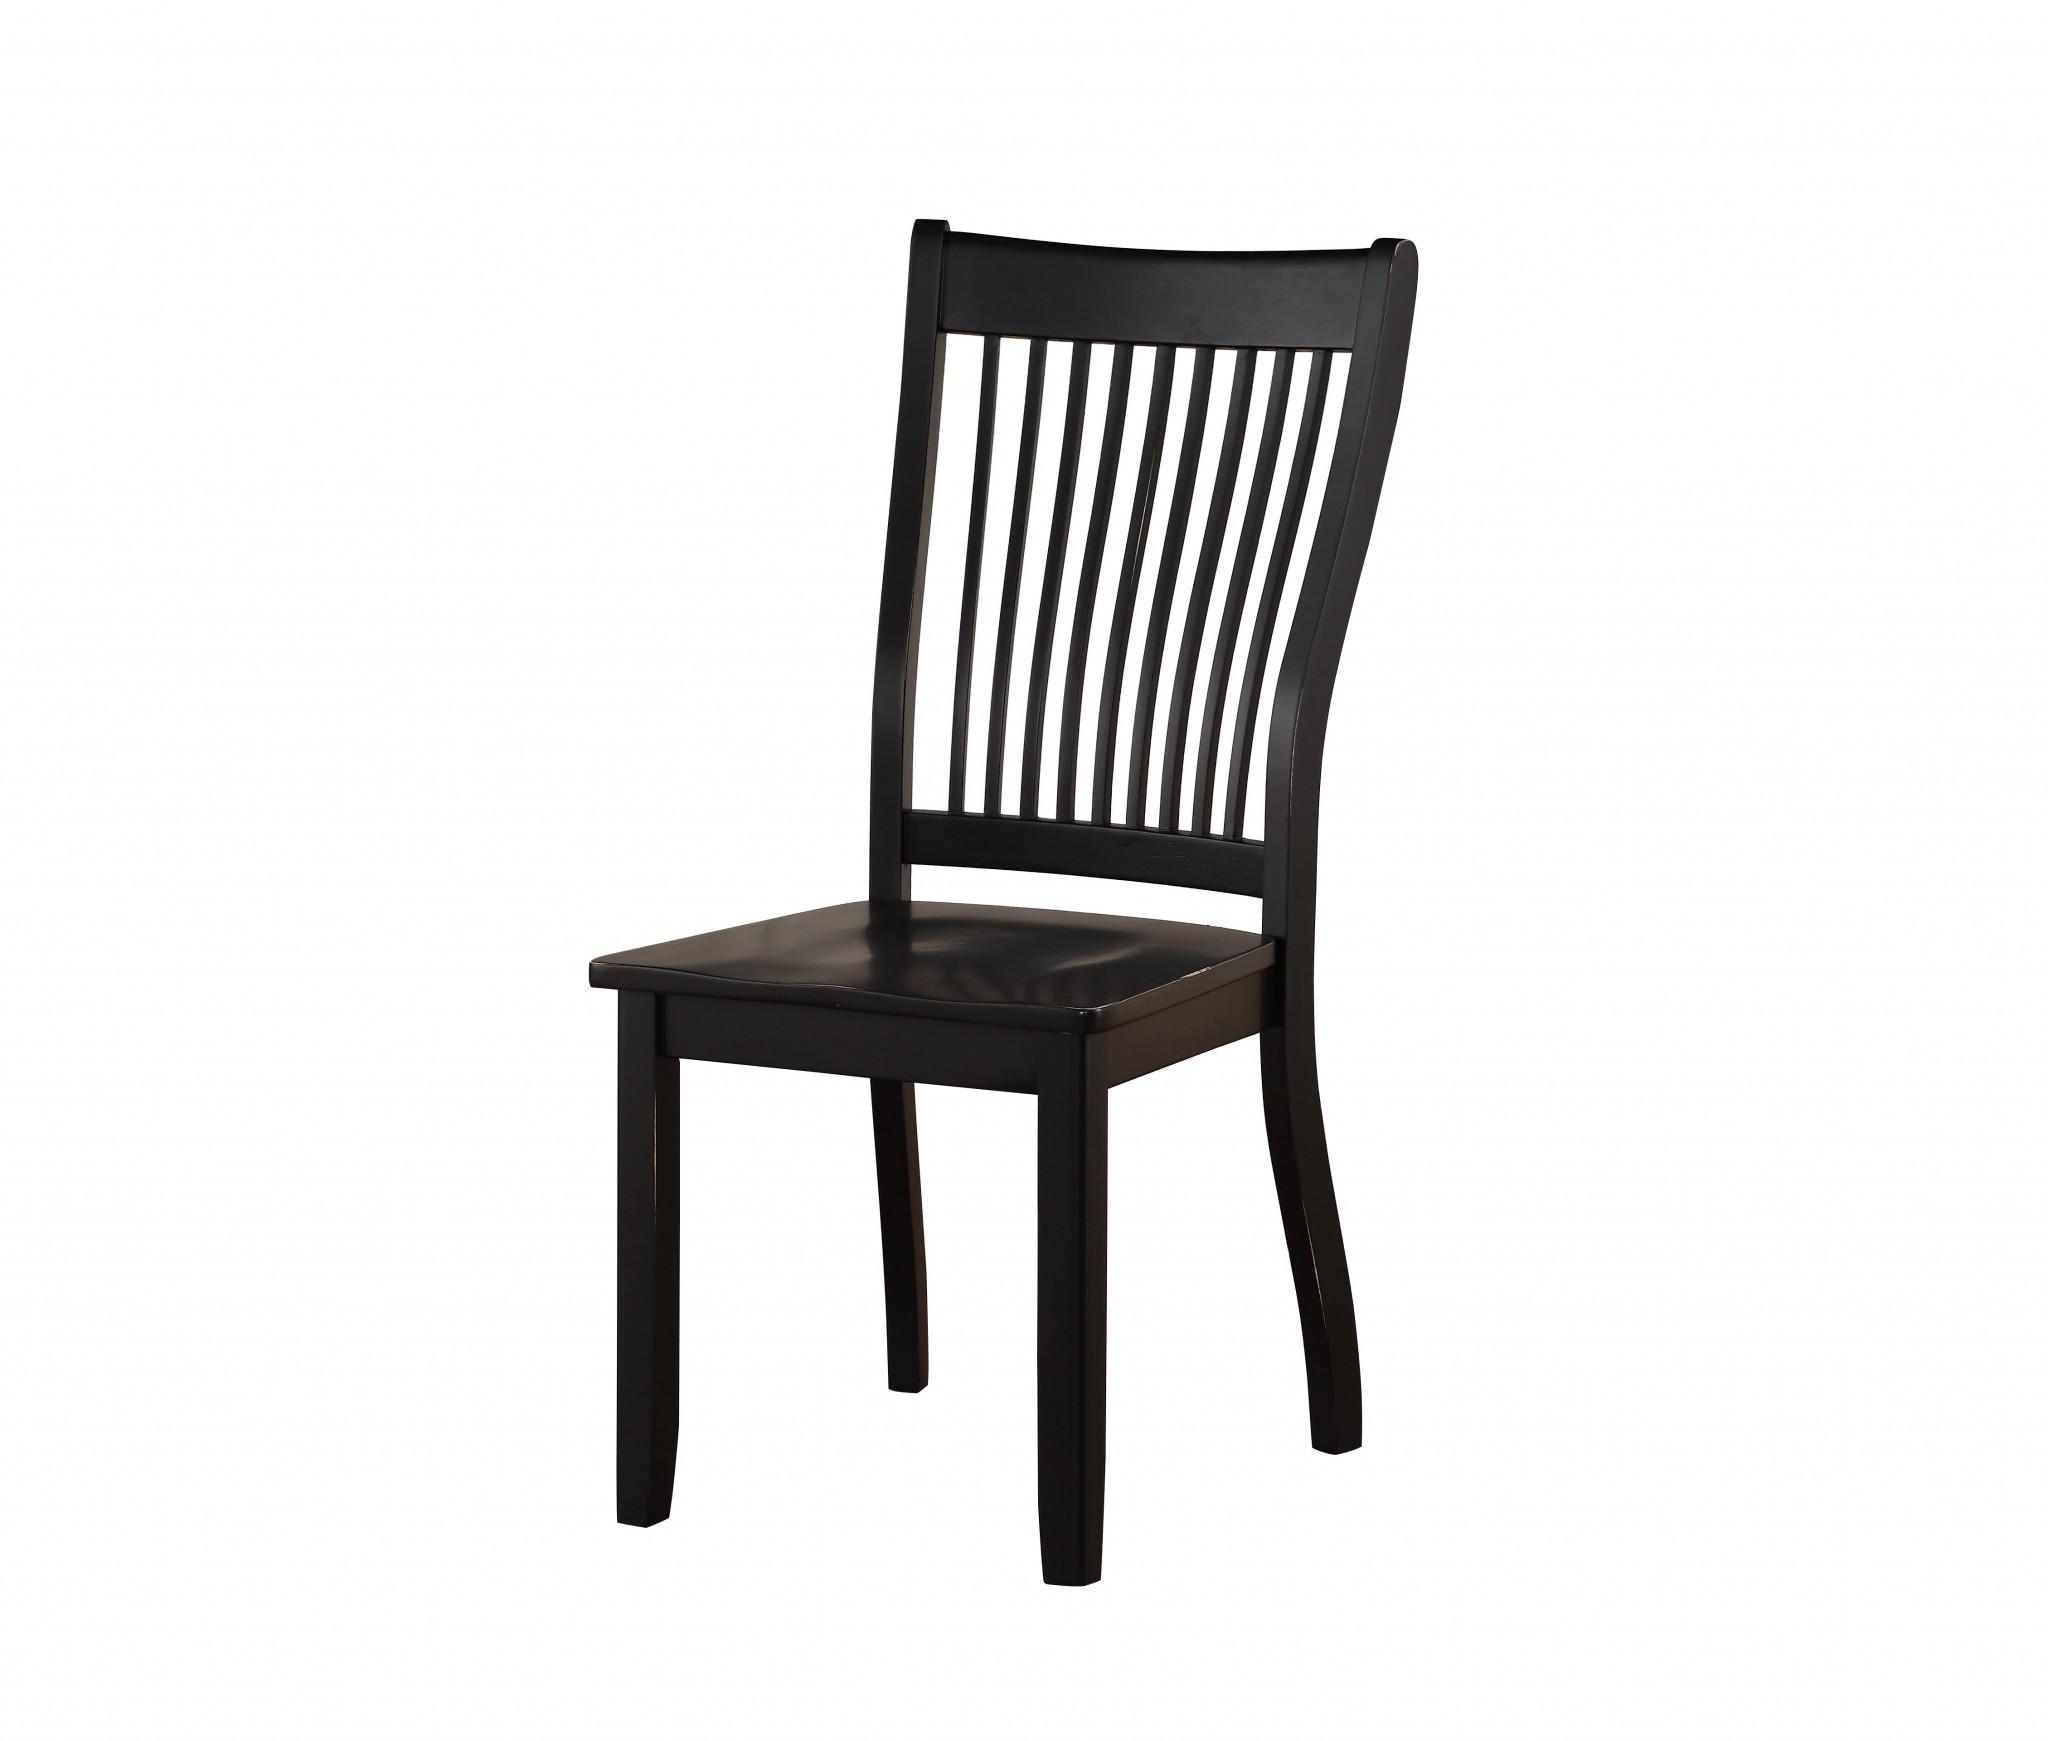 22 x 24 x 39 Black - Side Chair  (Set-2)